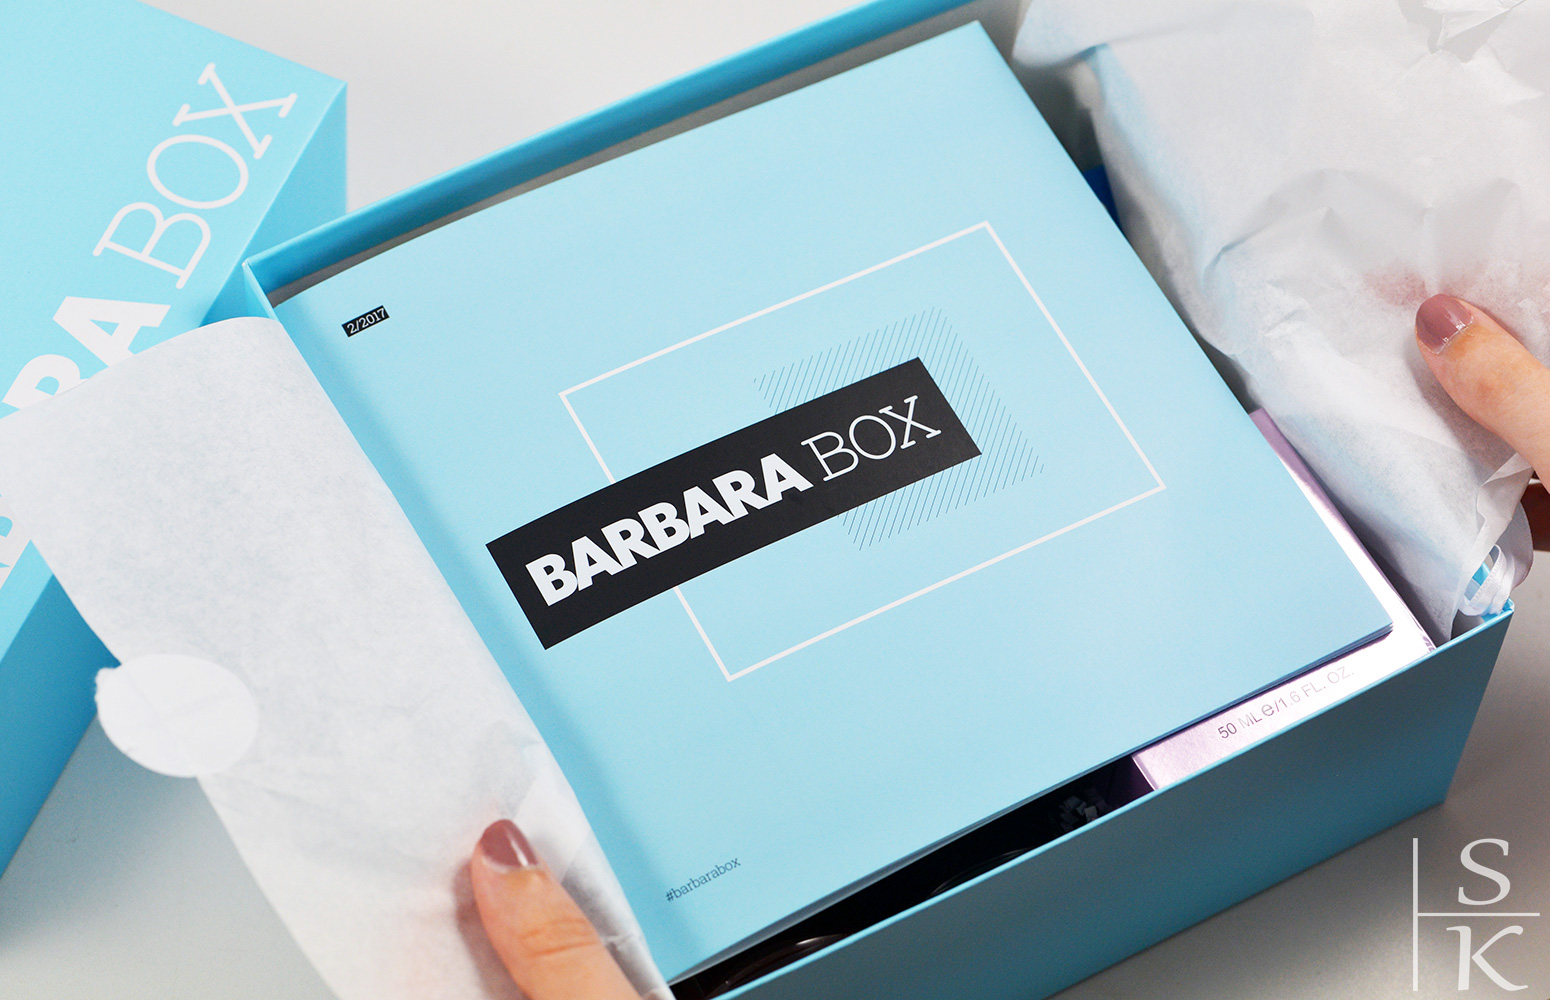 Barbara Box 02/2017